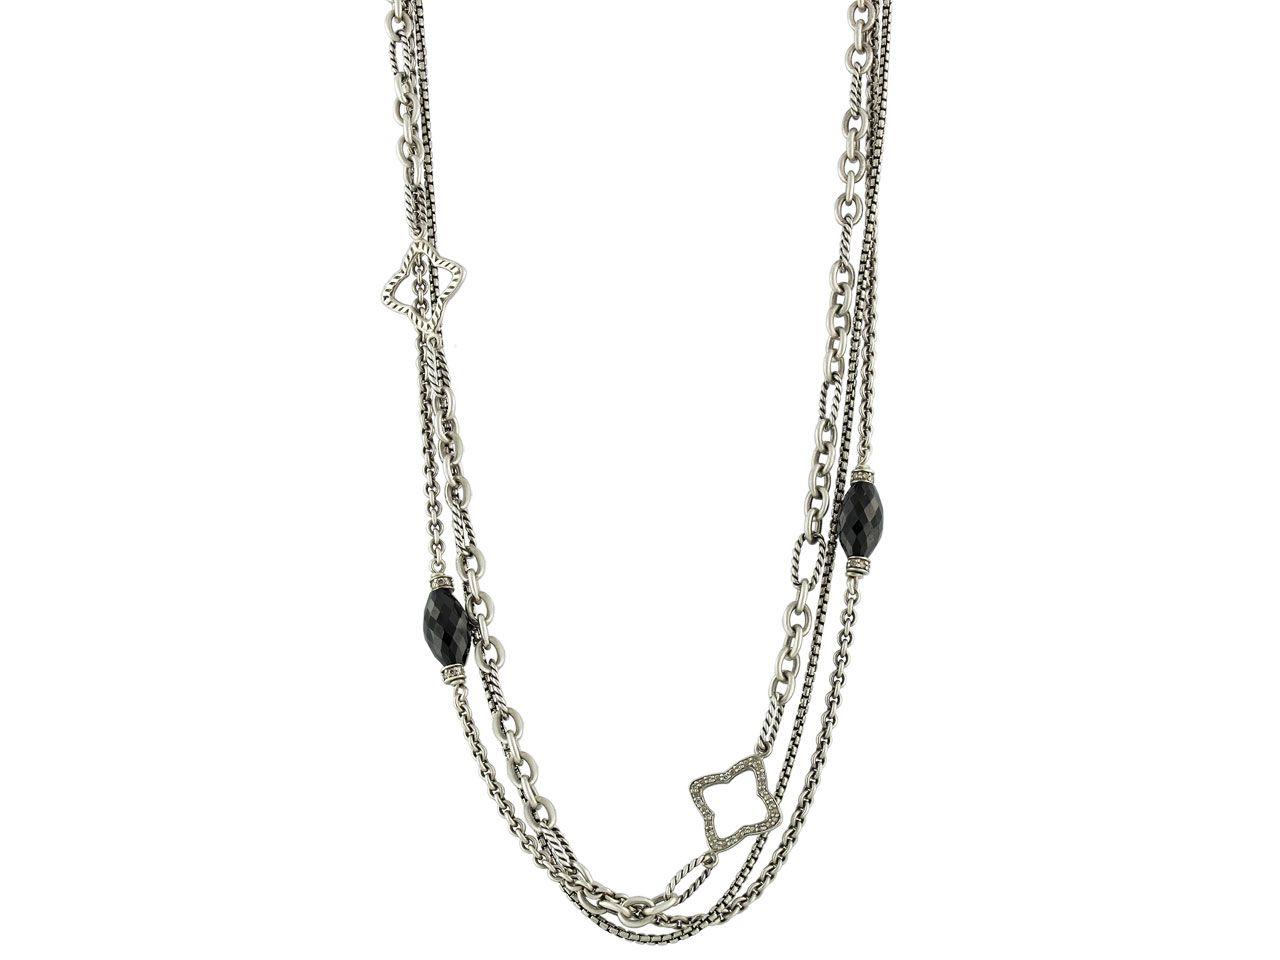 5e885c754de5a David Yurman Black Onyx and Diamond Quatrefoil Necklace from ...